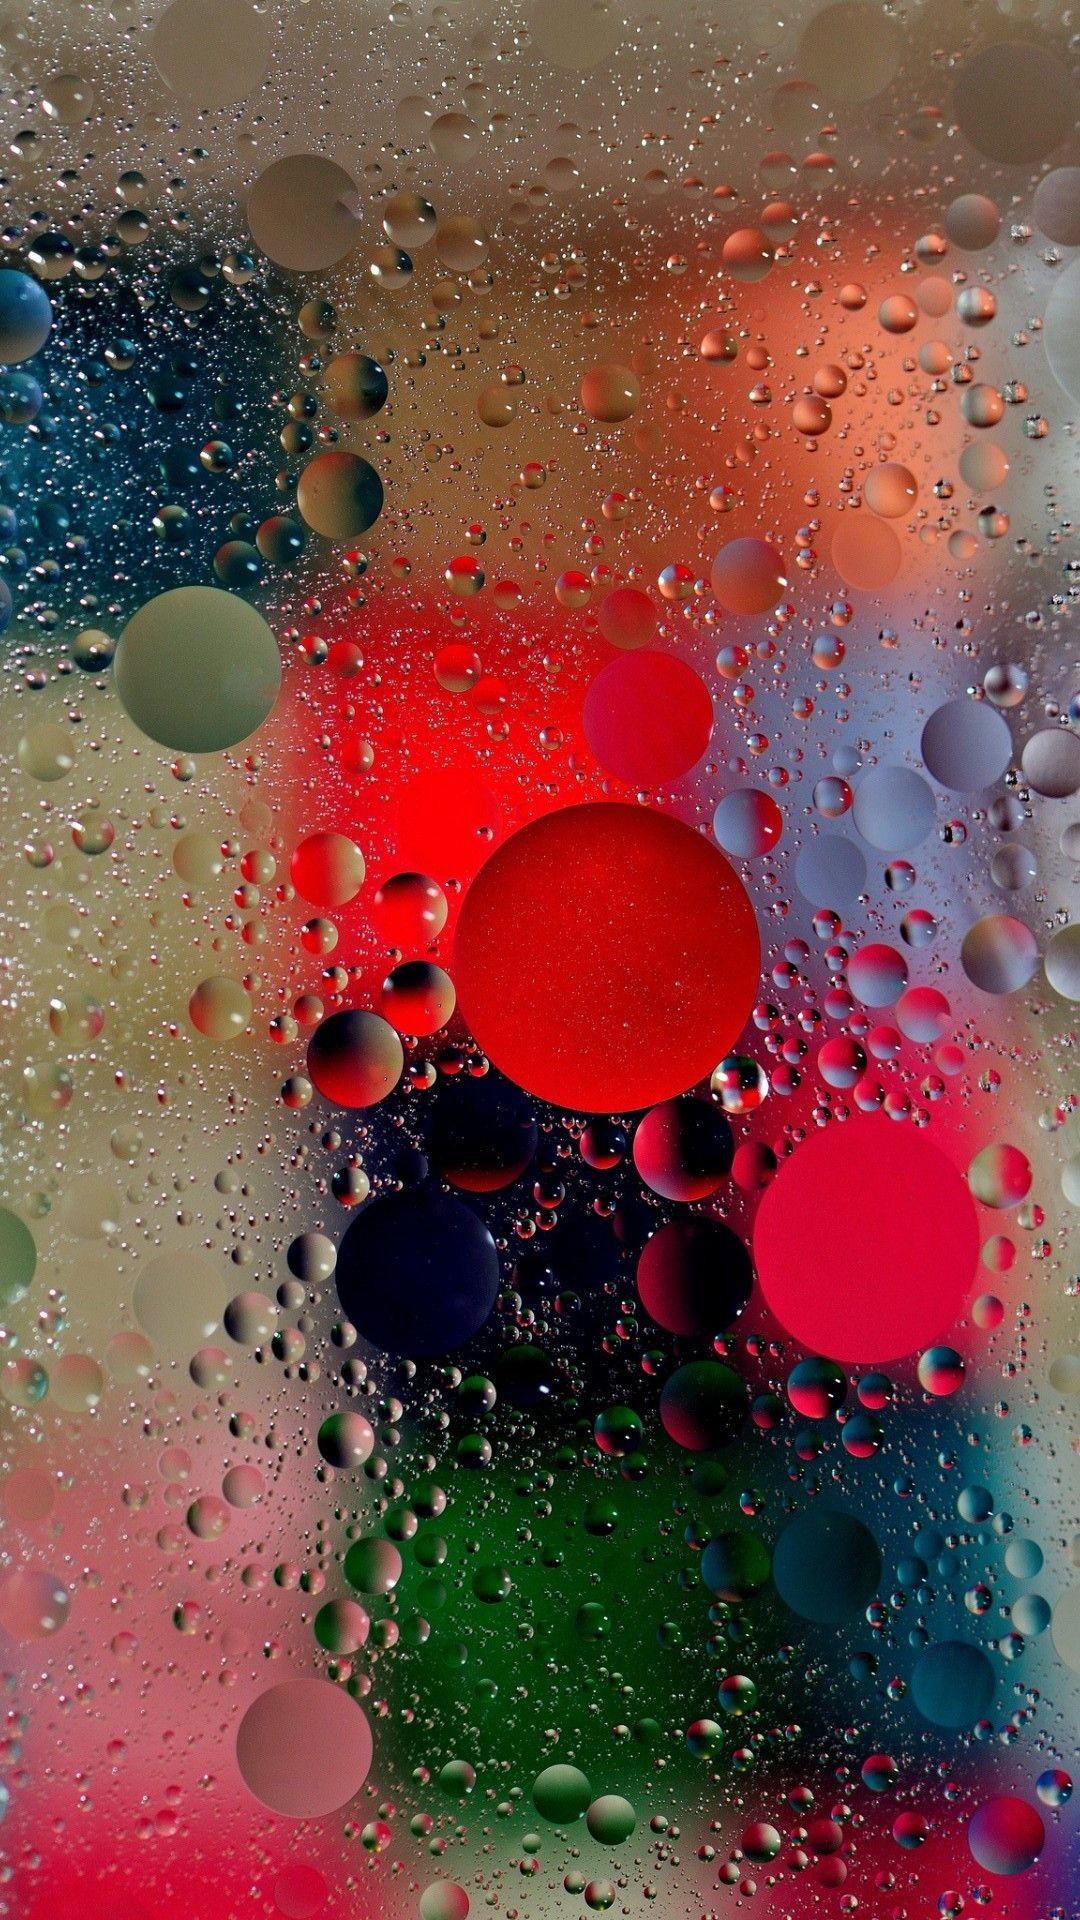 Wet Bubbles Wallpaper